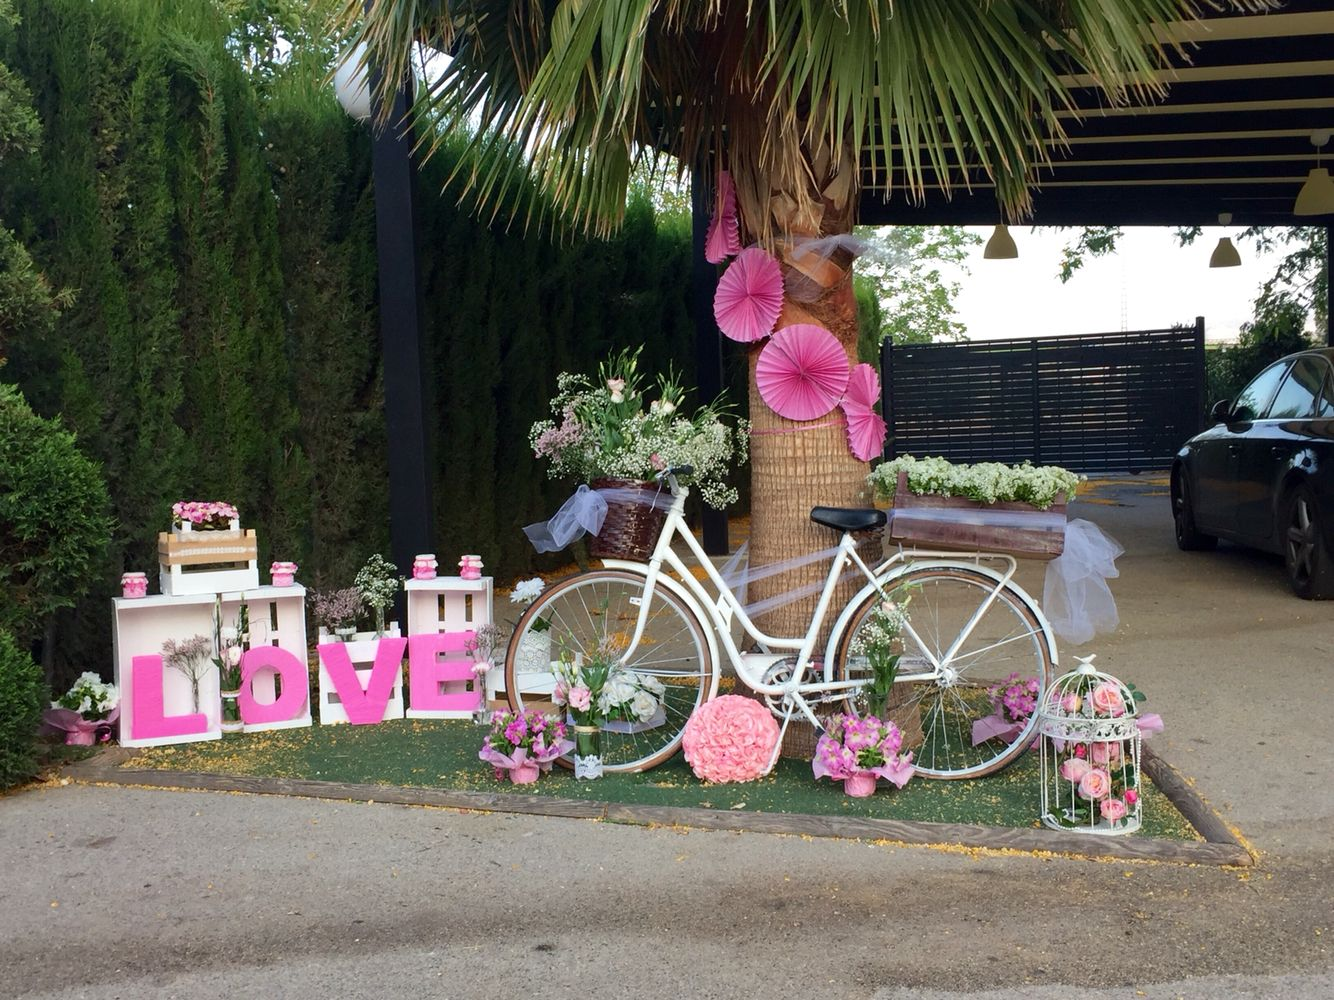 Decoracion boda vintage rom ntica bici con flores - Decoracion boda vintage ...